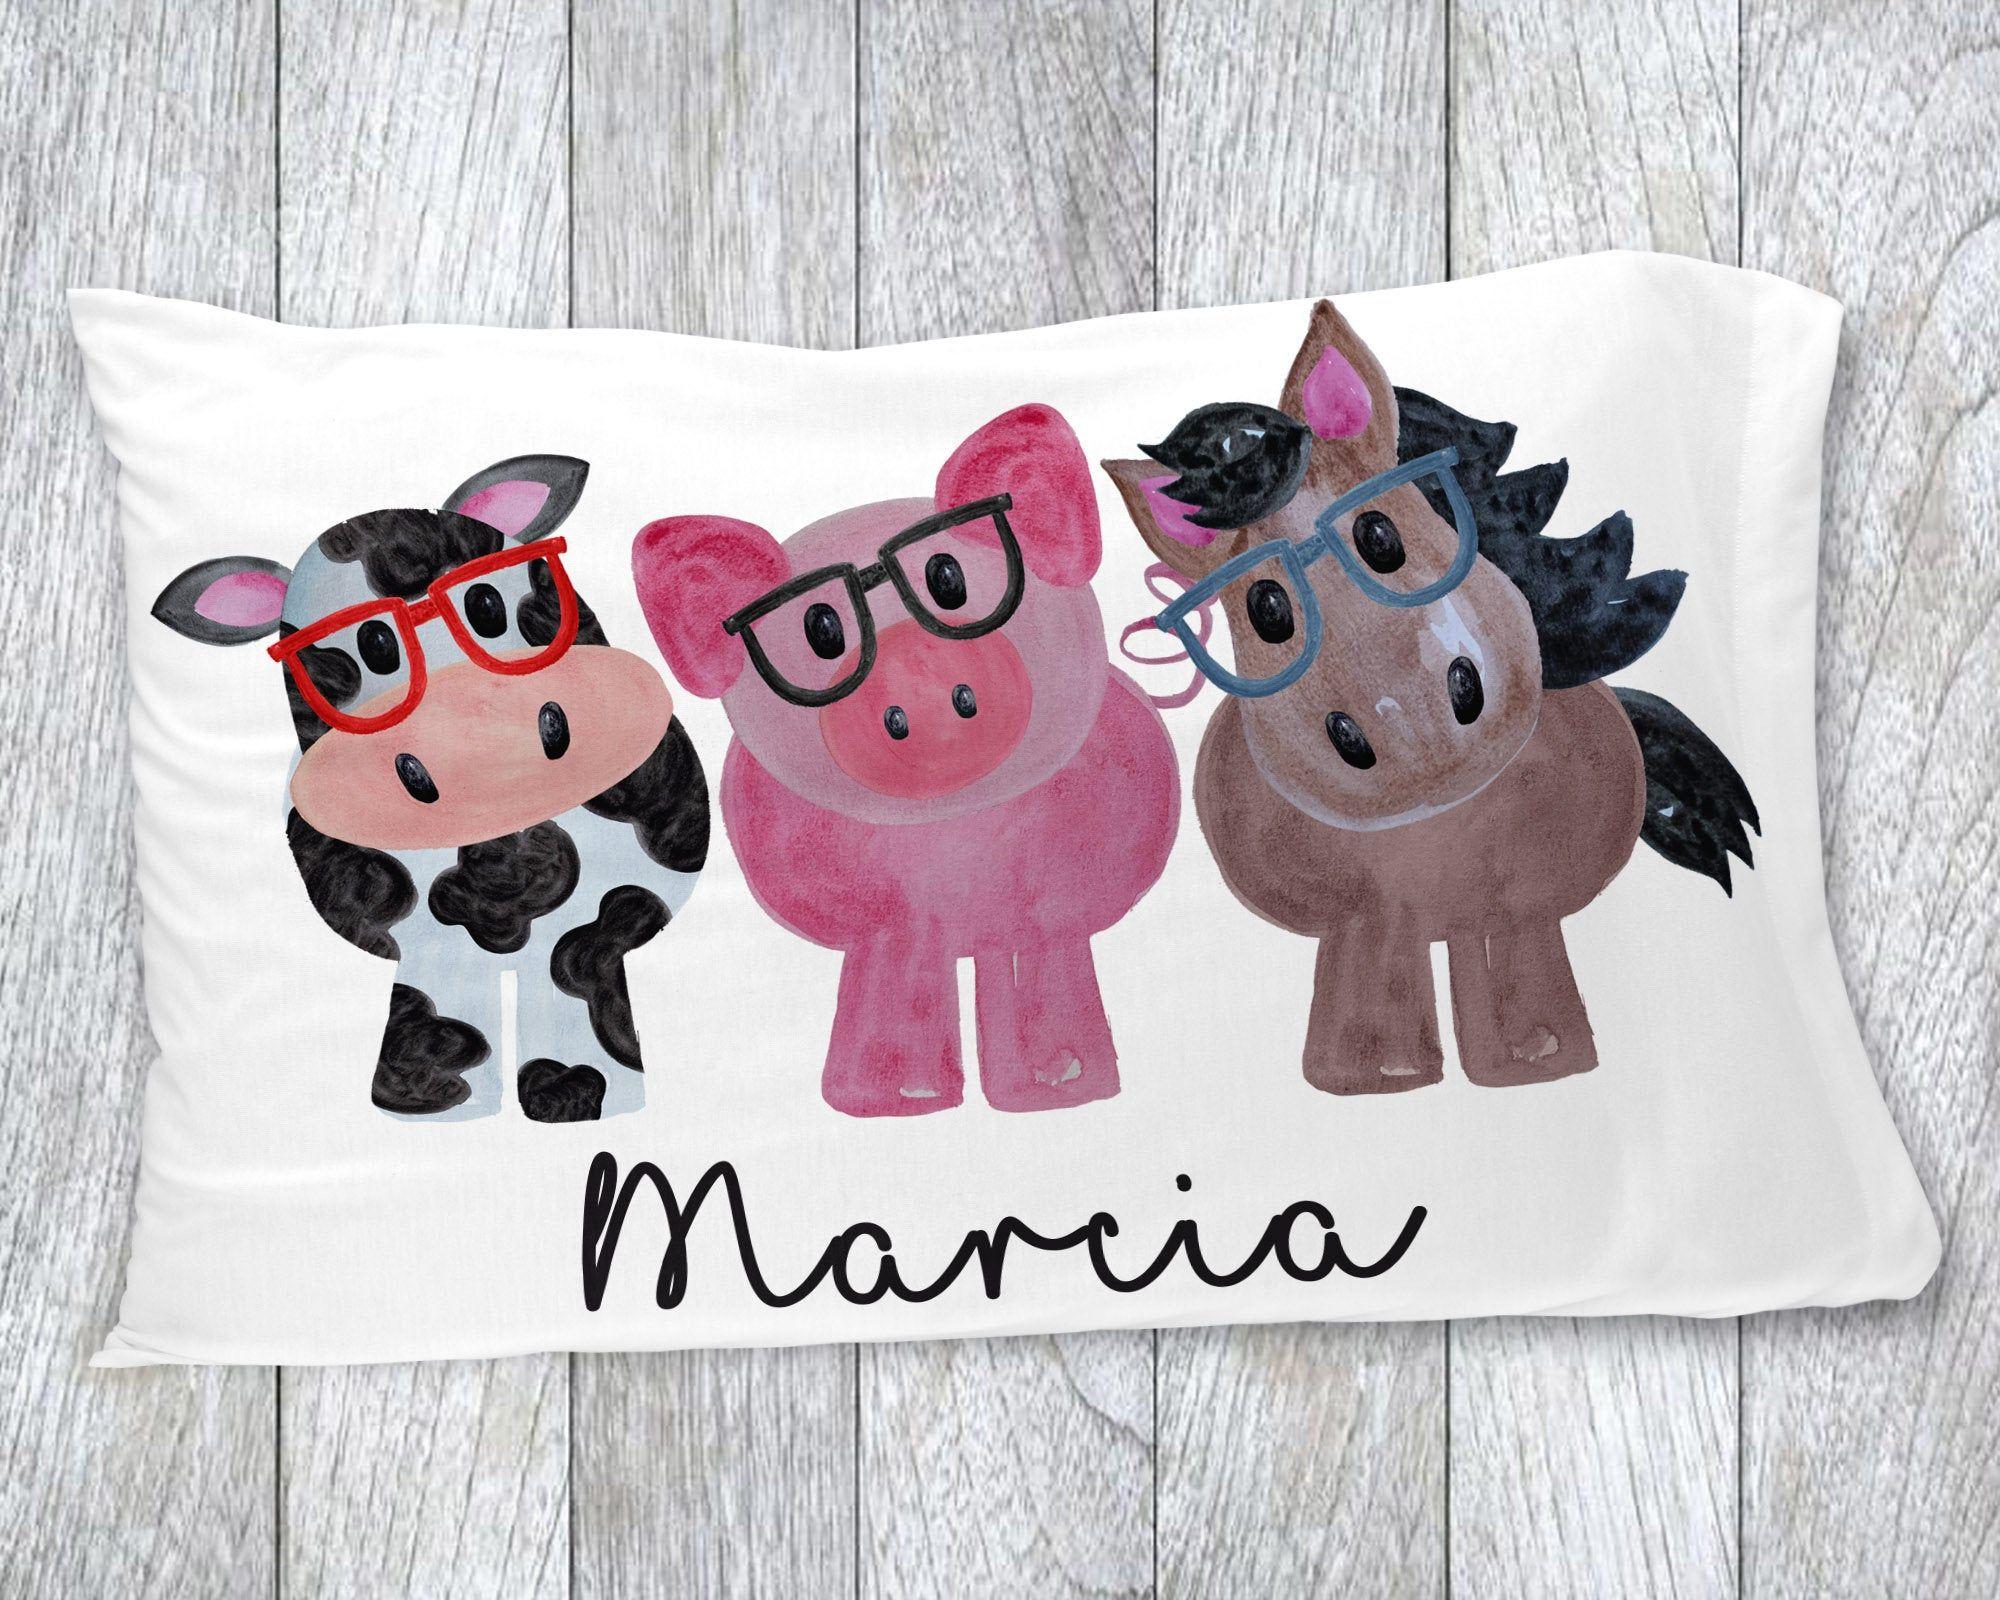 Kids Pillowcase Animal Pillowcase Personalized Pillowcase Etsy Kids Pillow Cases Personalized Pillow Cases Girls Personalized Gifts